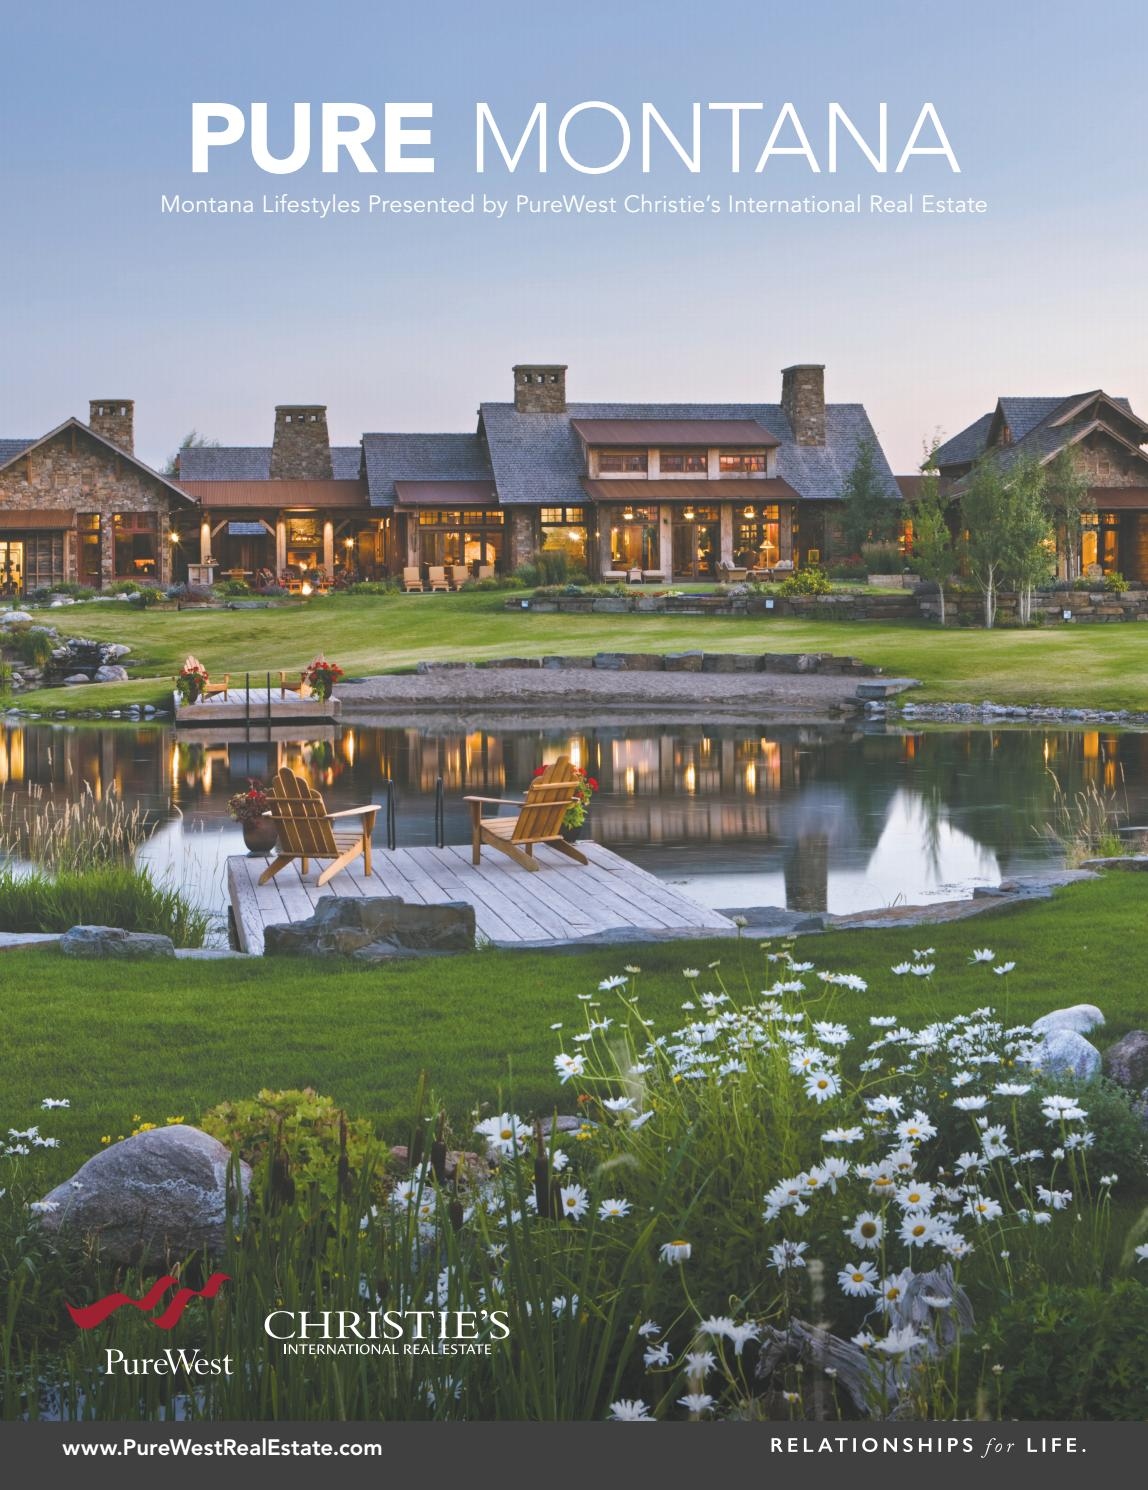 Pure Montana 2019 by PureWestRealEstate - issuu